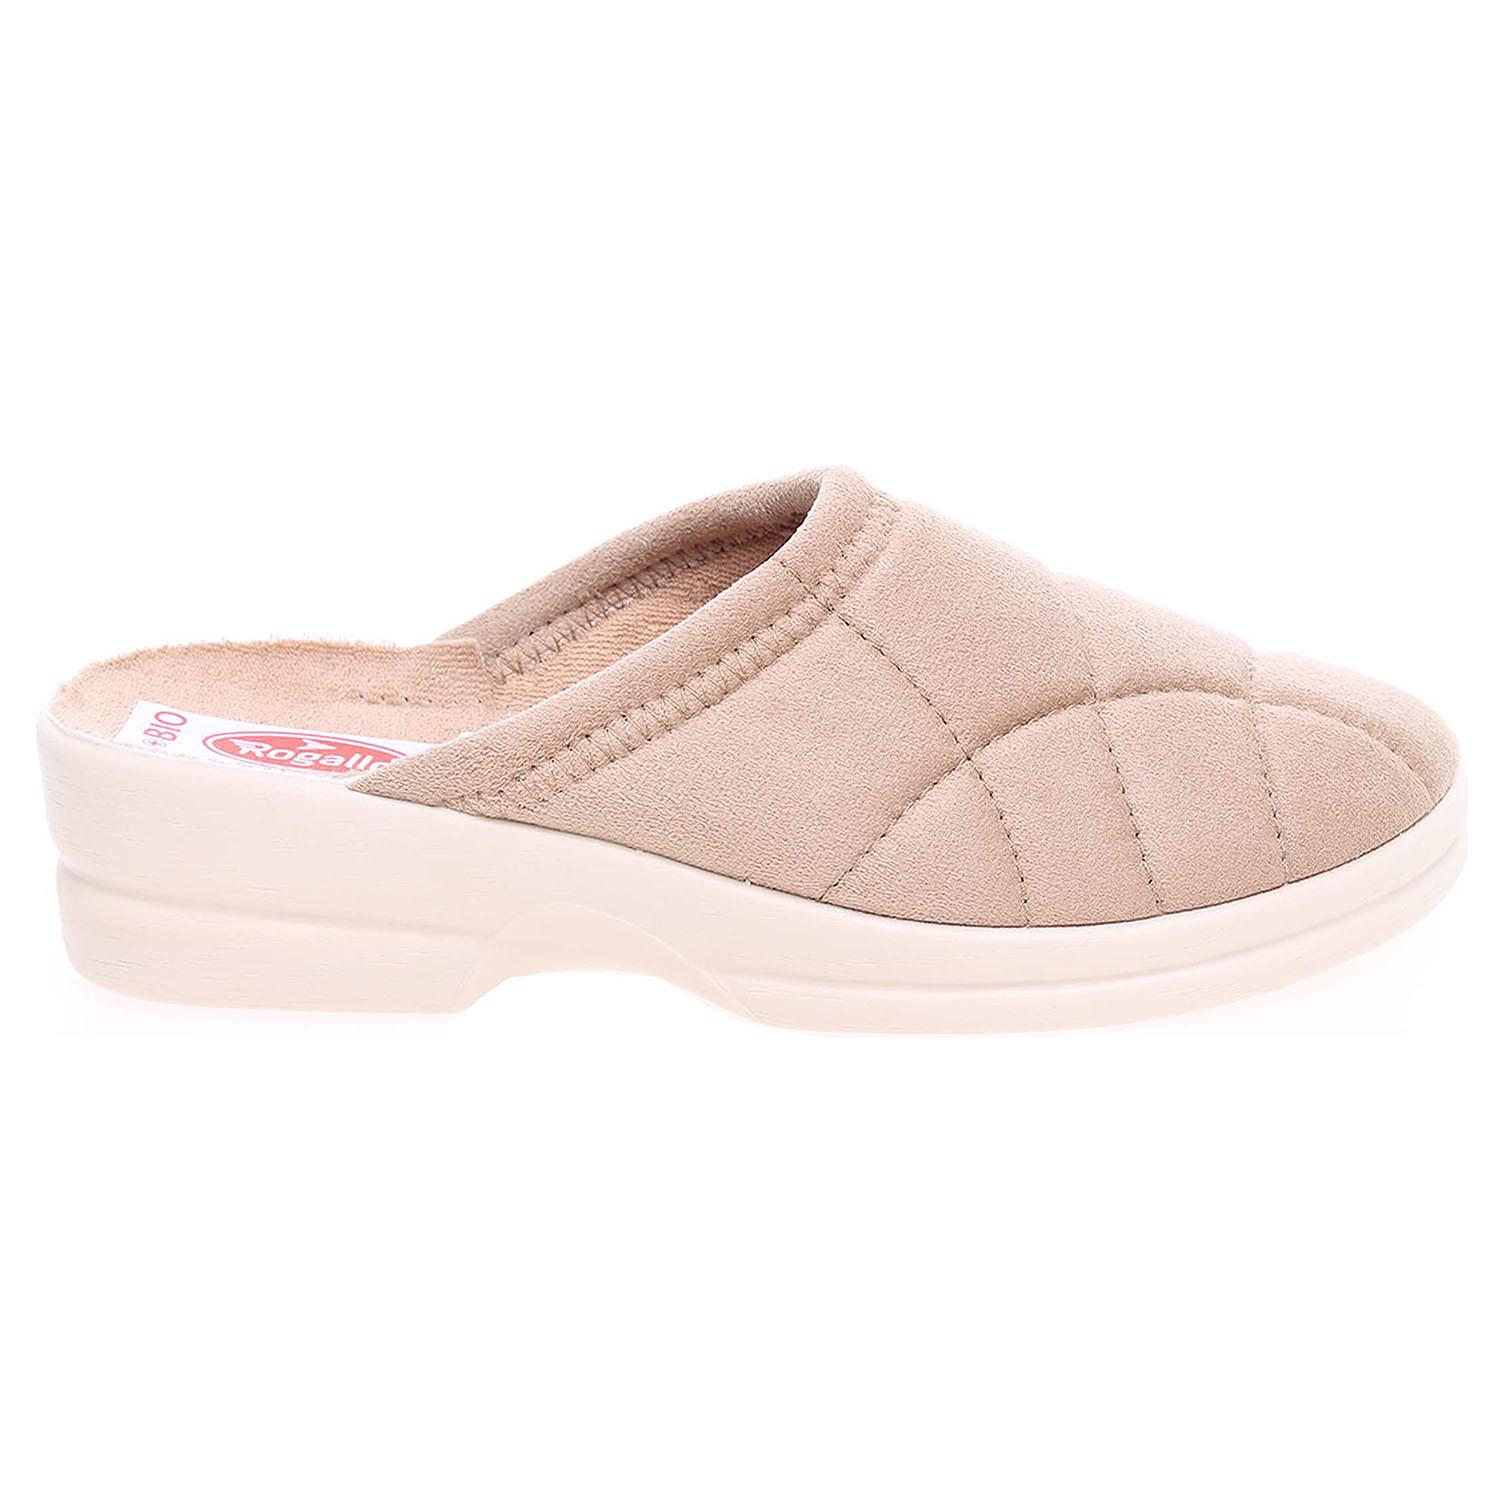 Rogallo domácí dámské pantofle 14779 béžové 41